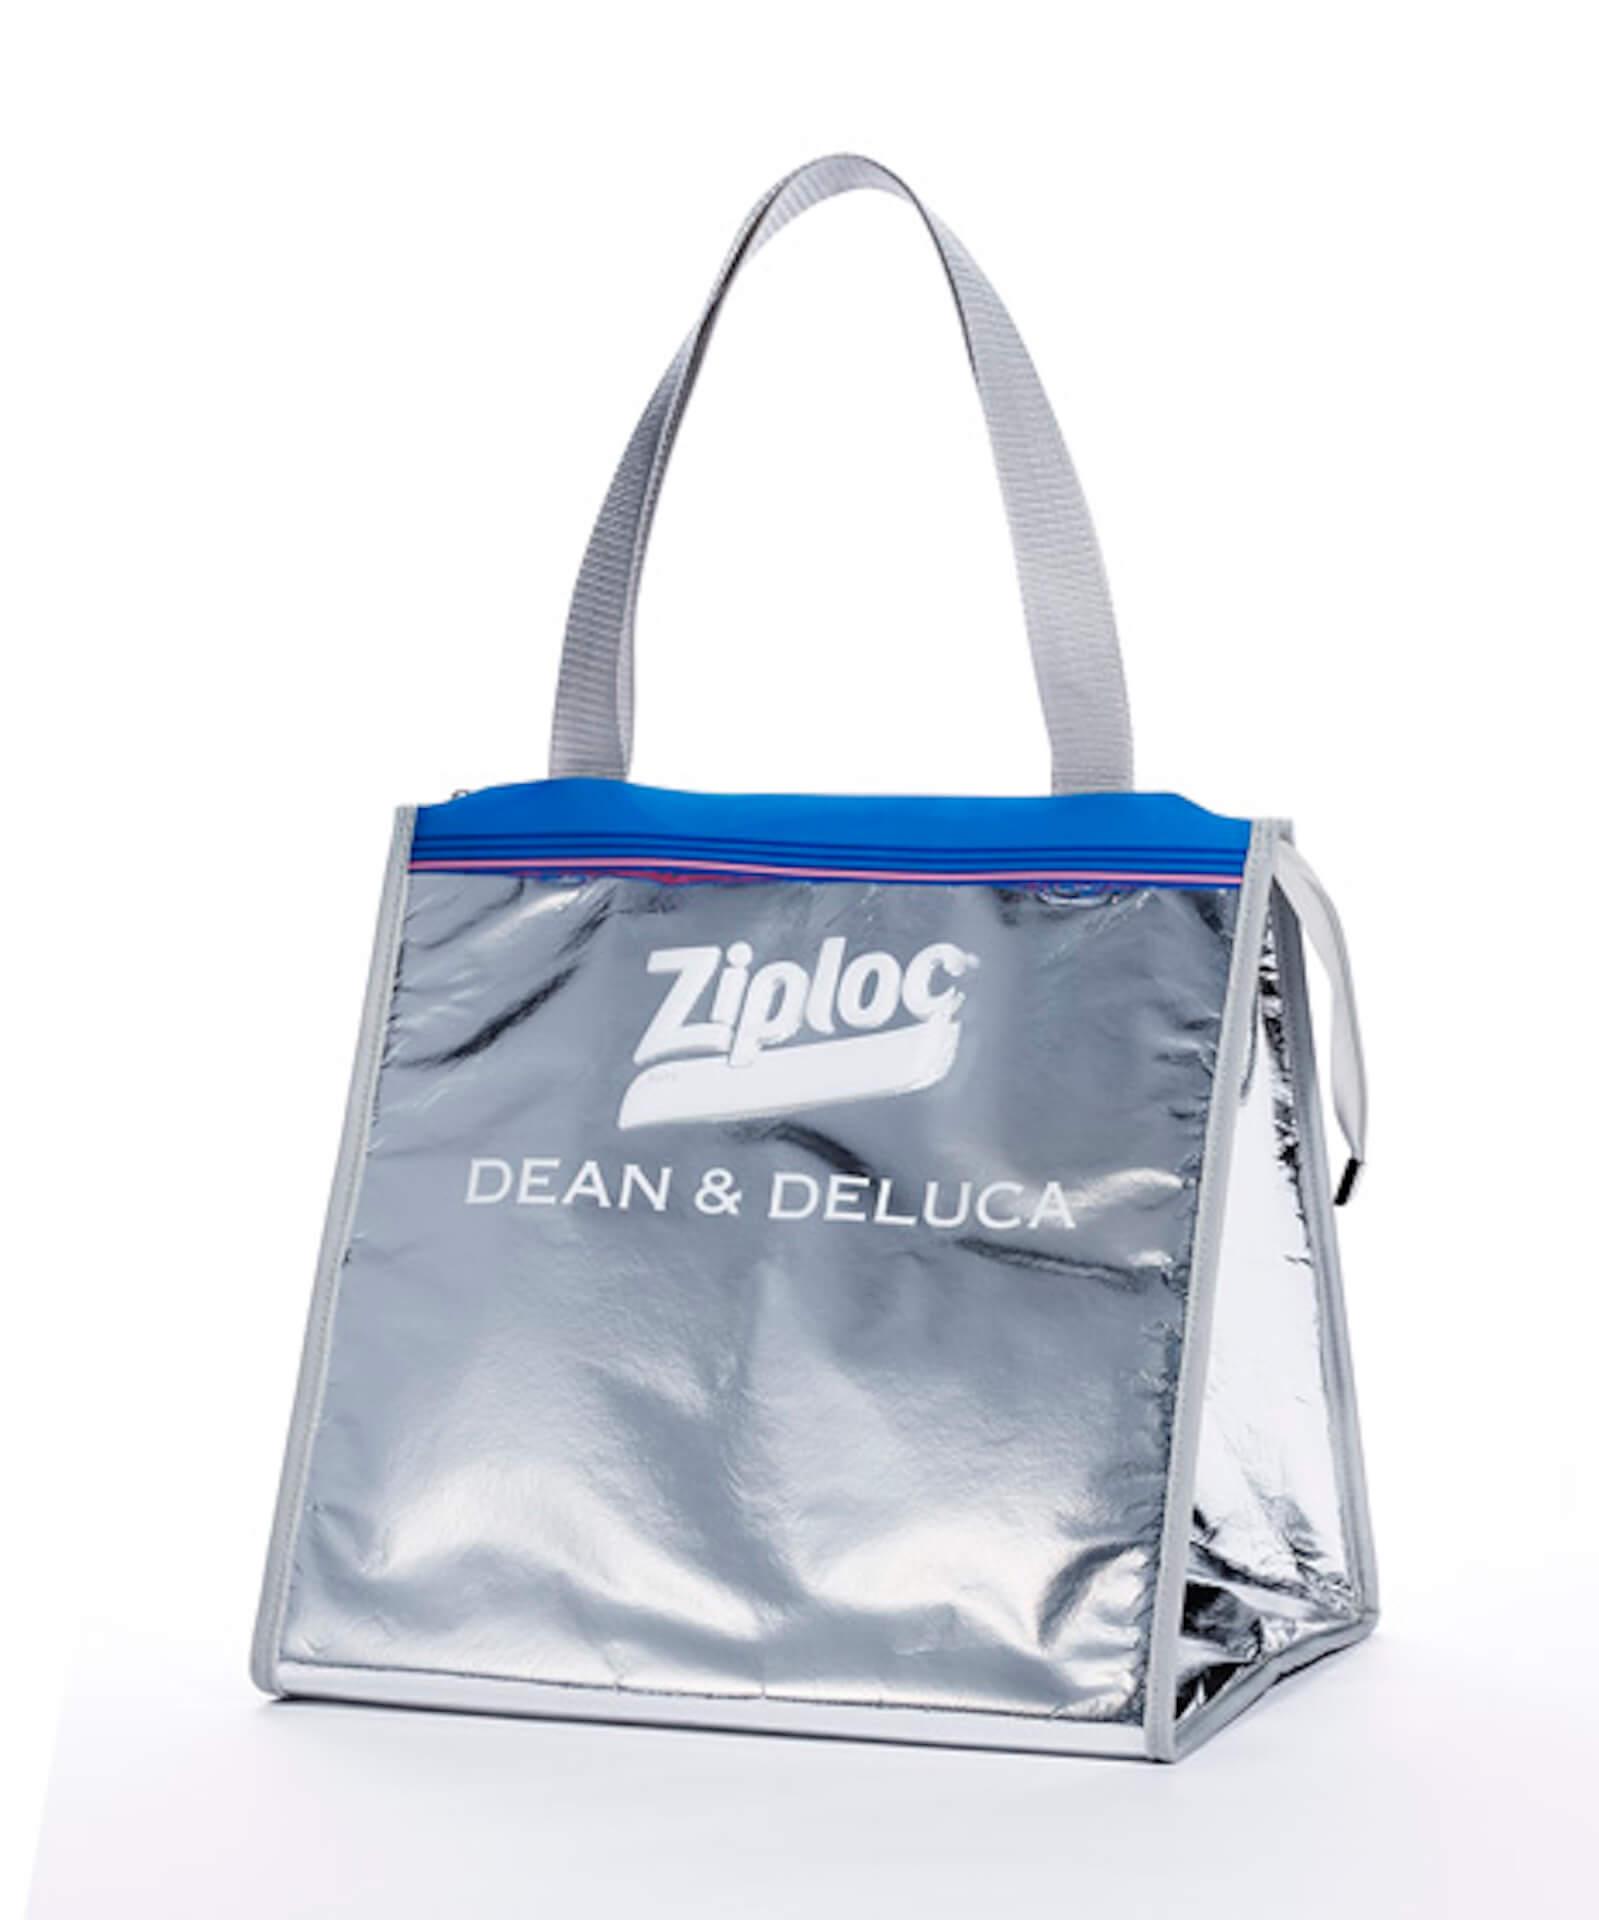 DEAN & DELUCAとBEAMS COUTURE、Ziplocのコラボクーラーバッグが再度登場!3サイズ展開で発売決定 life210419_deananddeluca_beams_ziploc_5